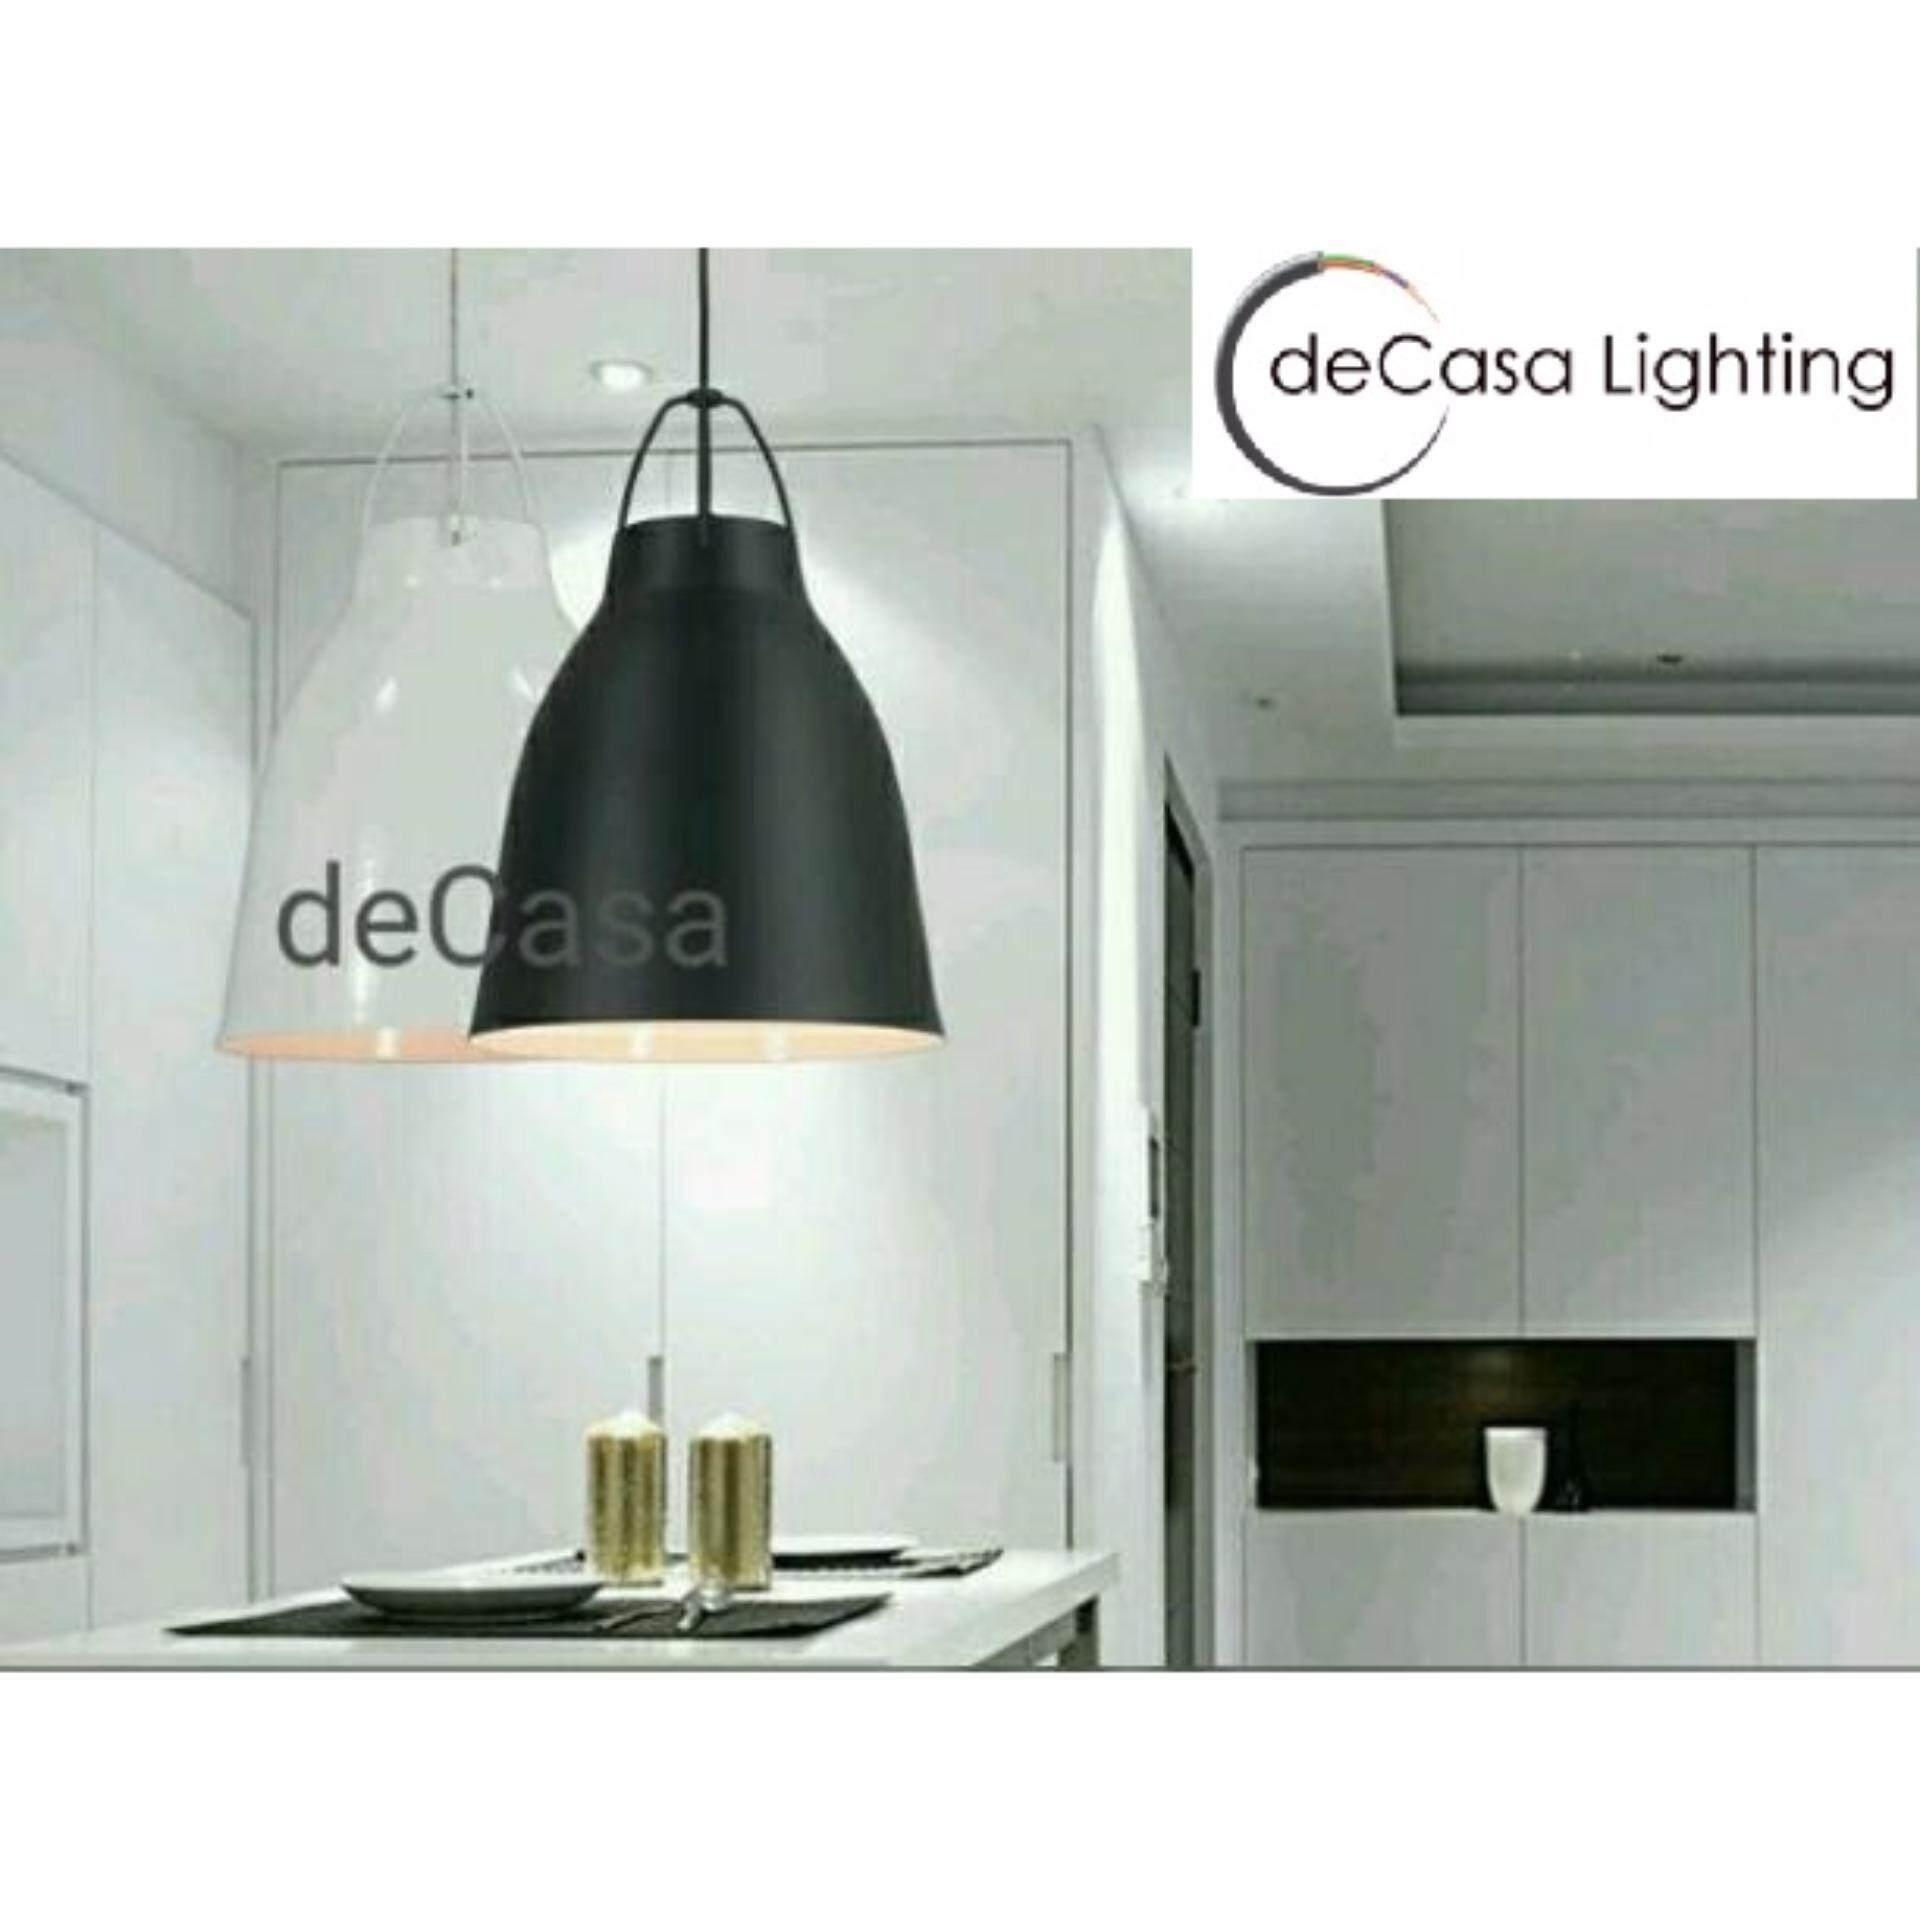 Decasa Designer White Simple Baisc Loft Pendant Light DECASA Designer Ceiling Light (LY-2529-WH)